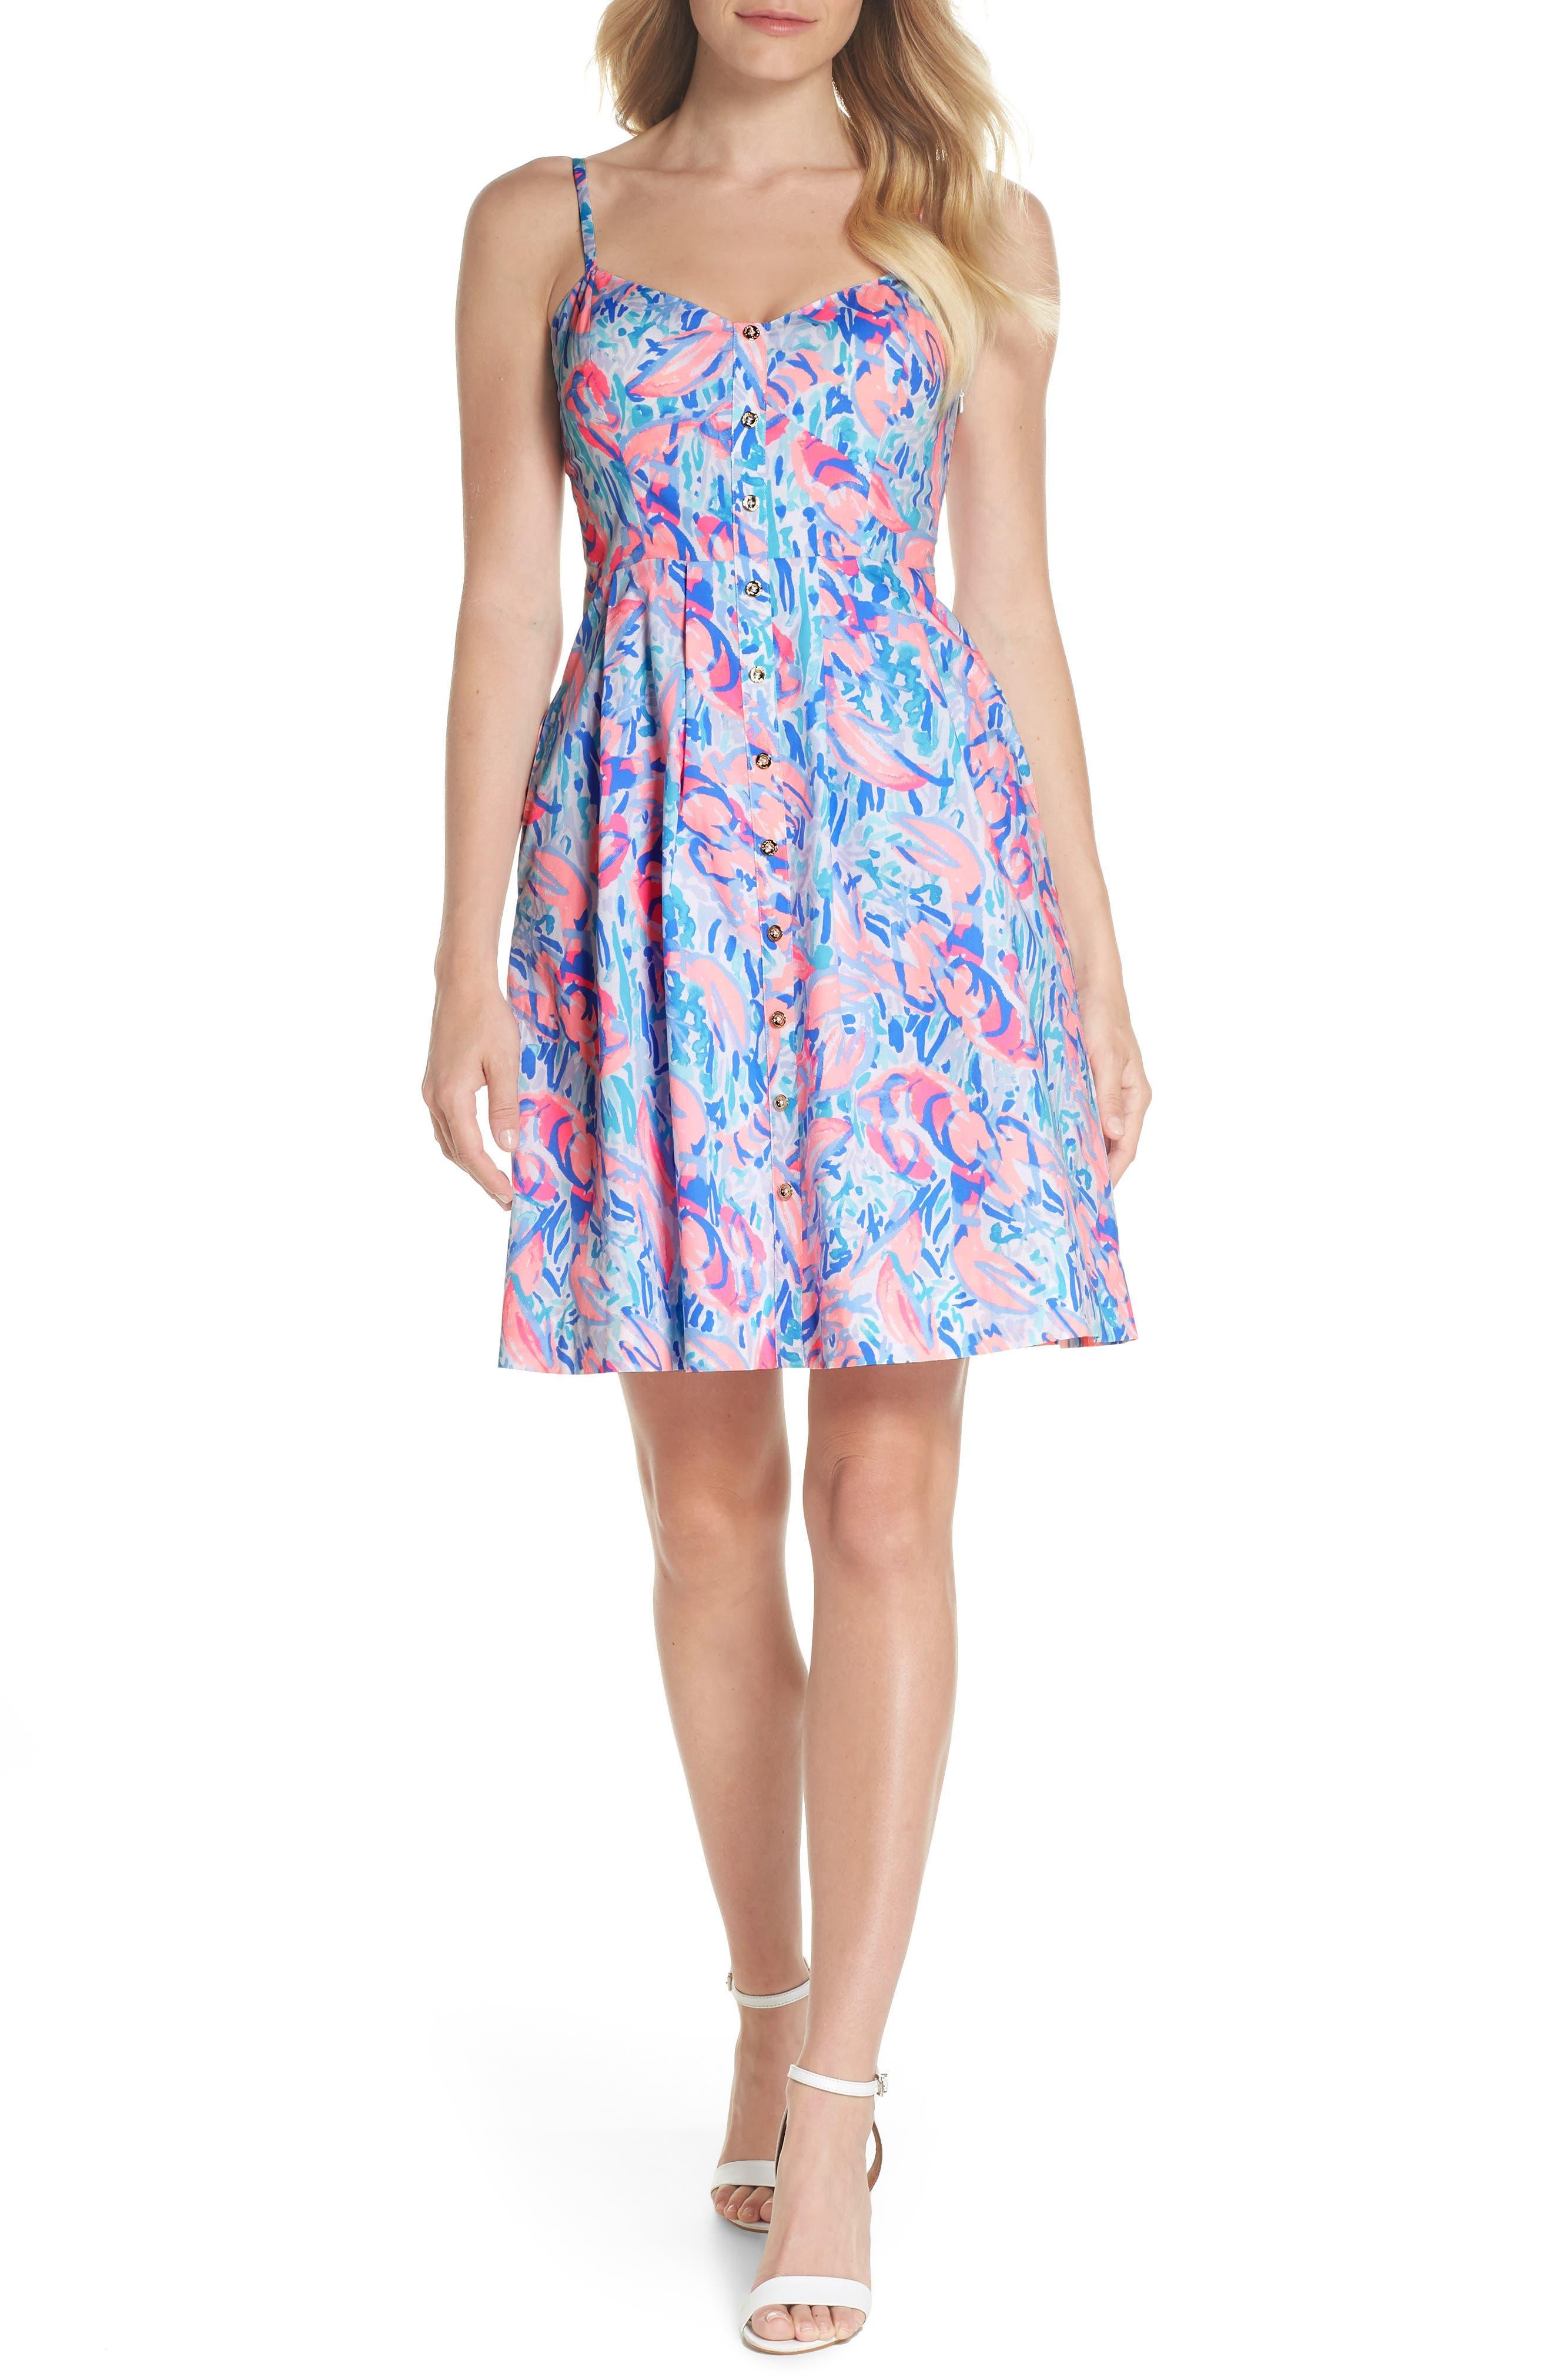 Easton Fit & Flare Dress,                             Main thumbnail 1, color,                             695